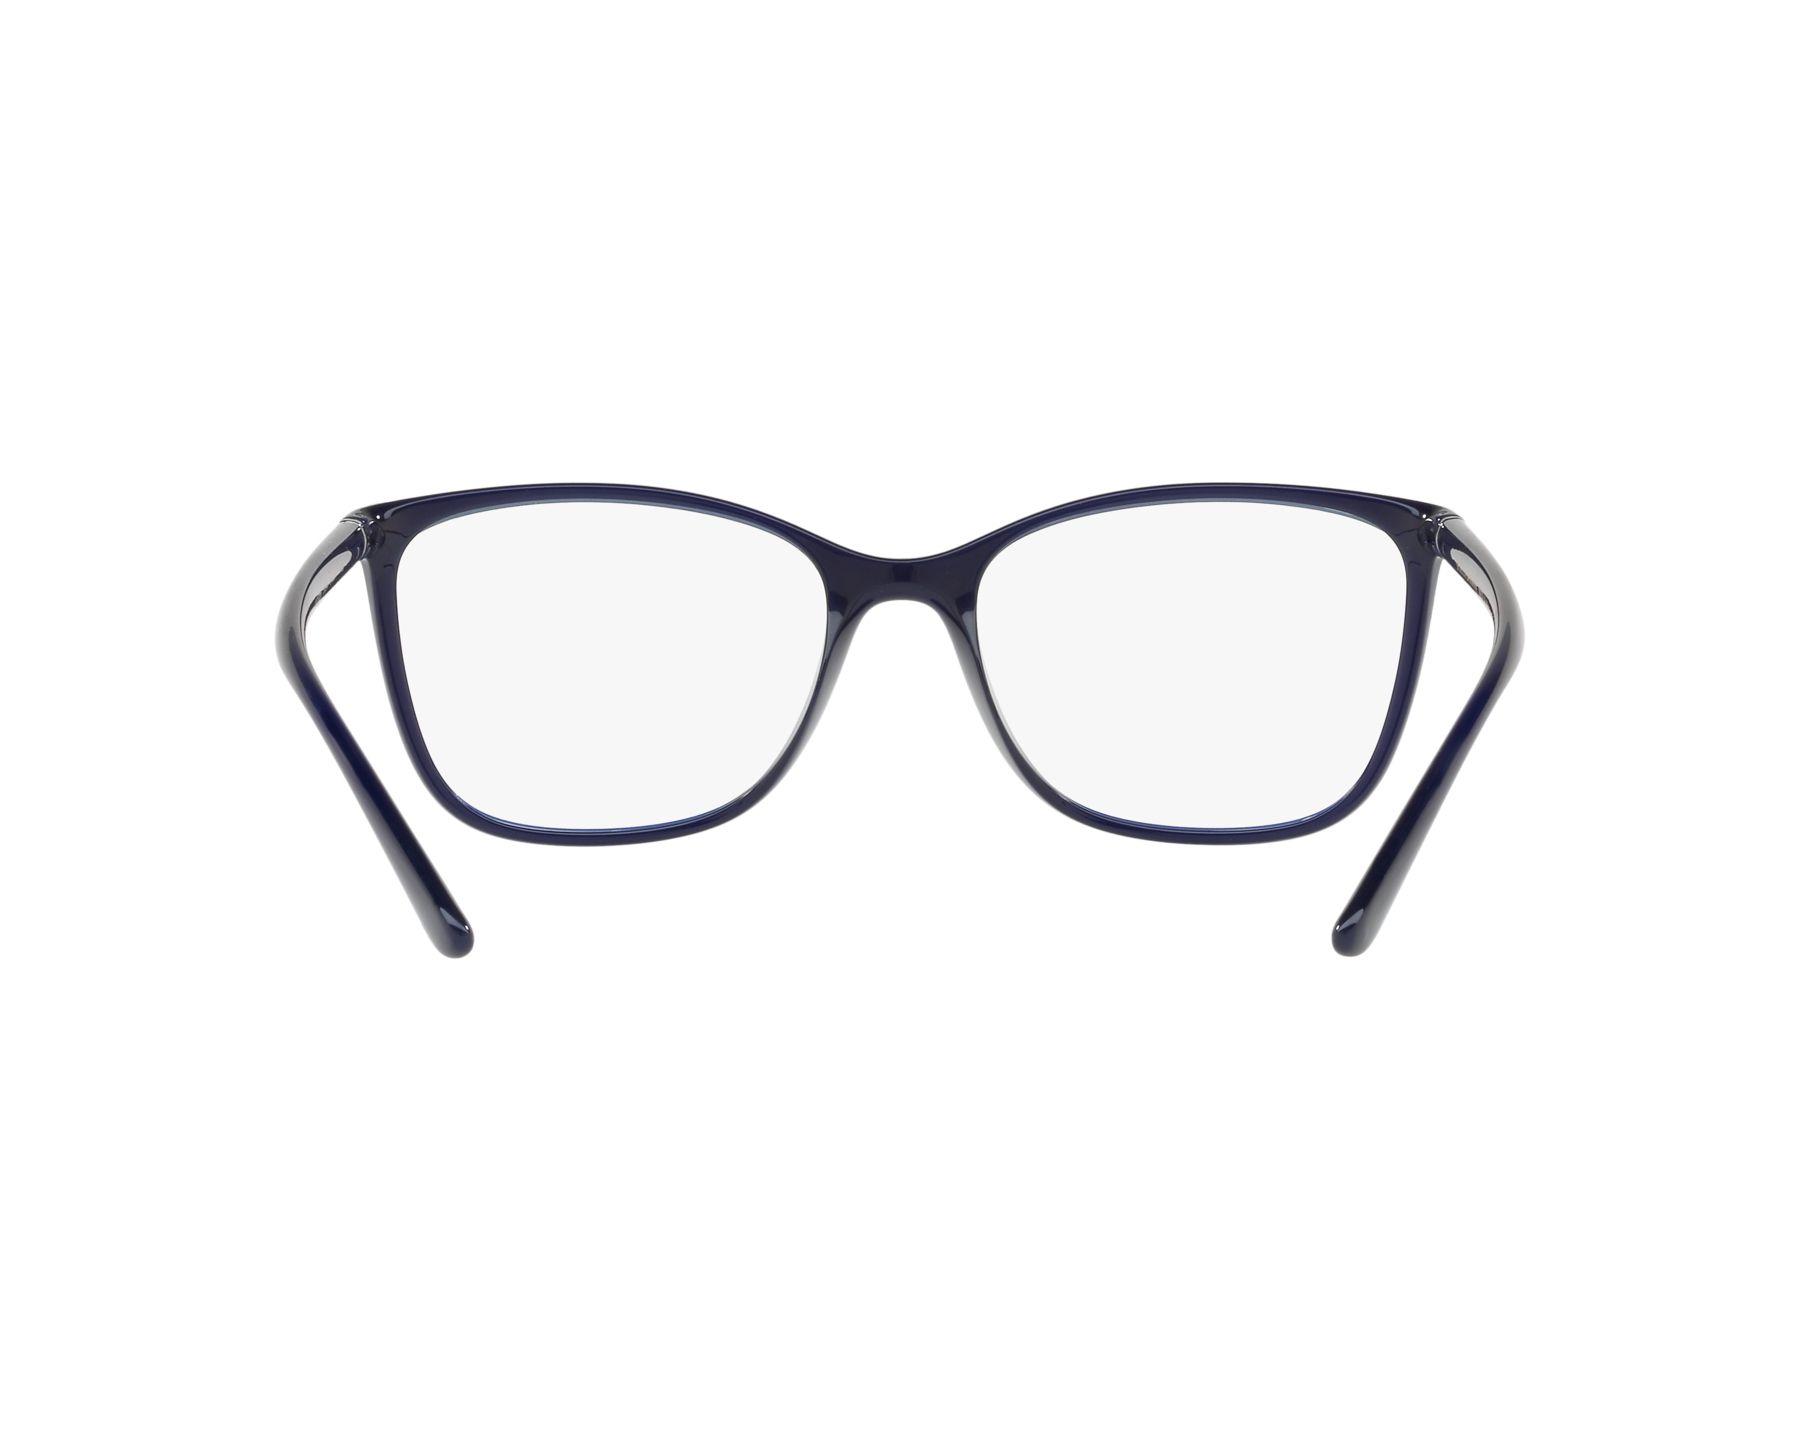 54a8d247acf eyeglasses Dolce   Gabbana DG-5026 3094 54-17 Blue 360 degree view 7